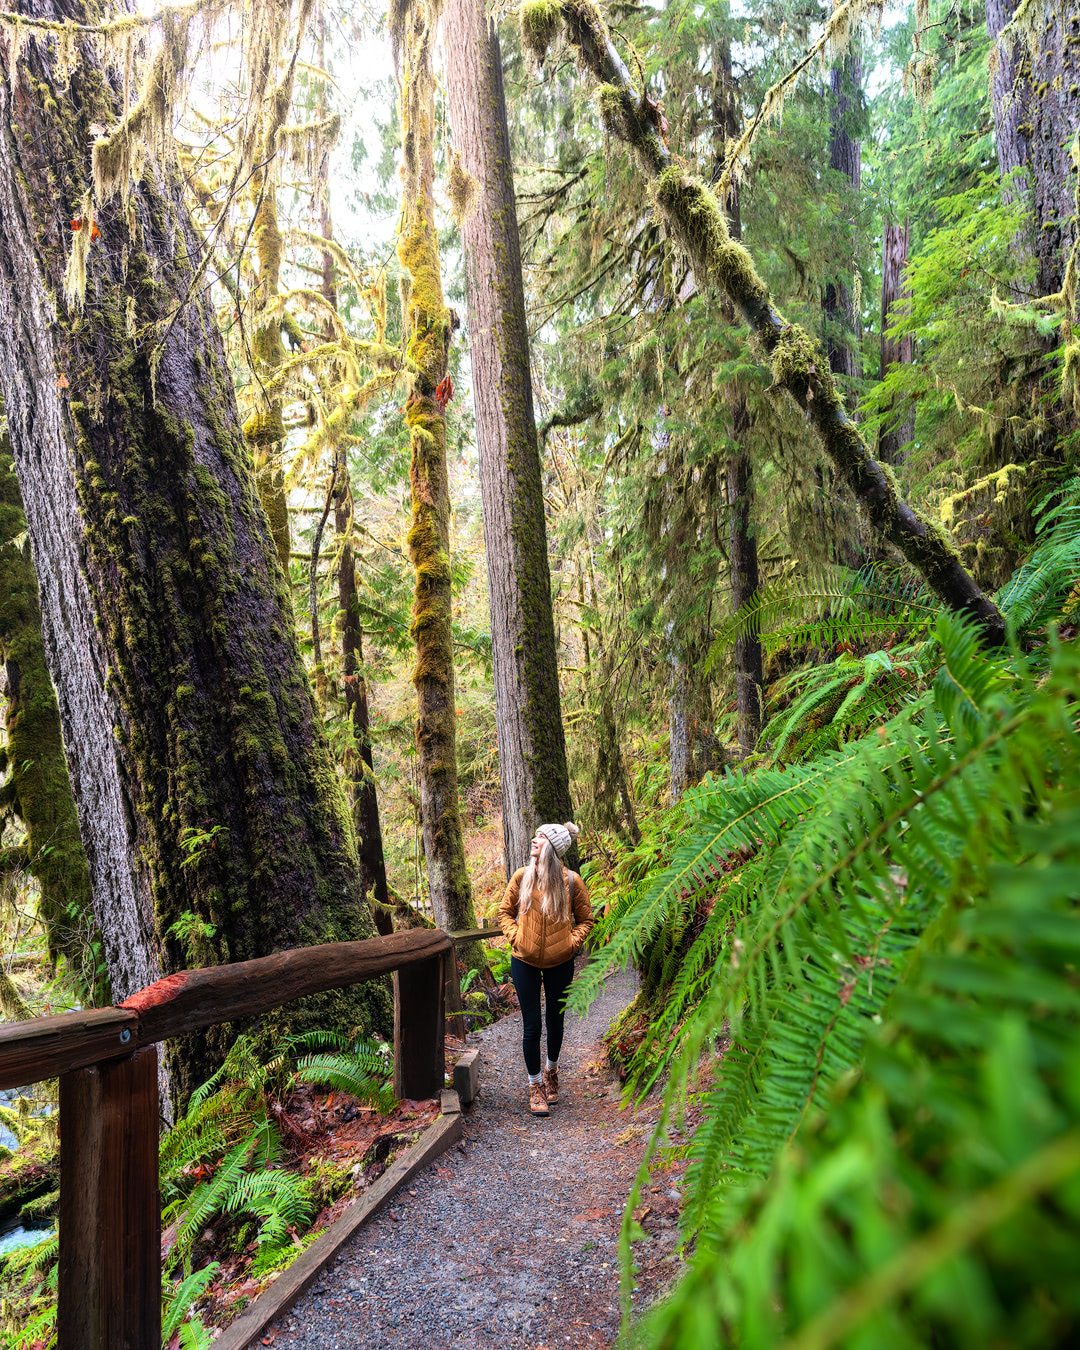 Beginner Friendly Hikes in Washington State - Hoh Rainforest Loop